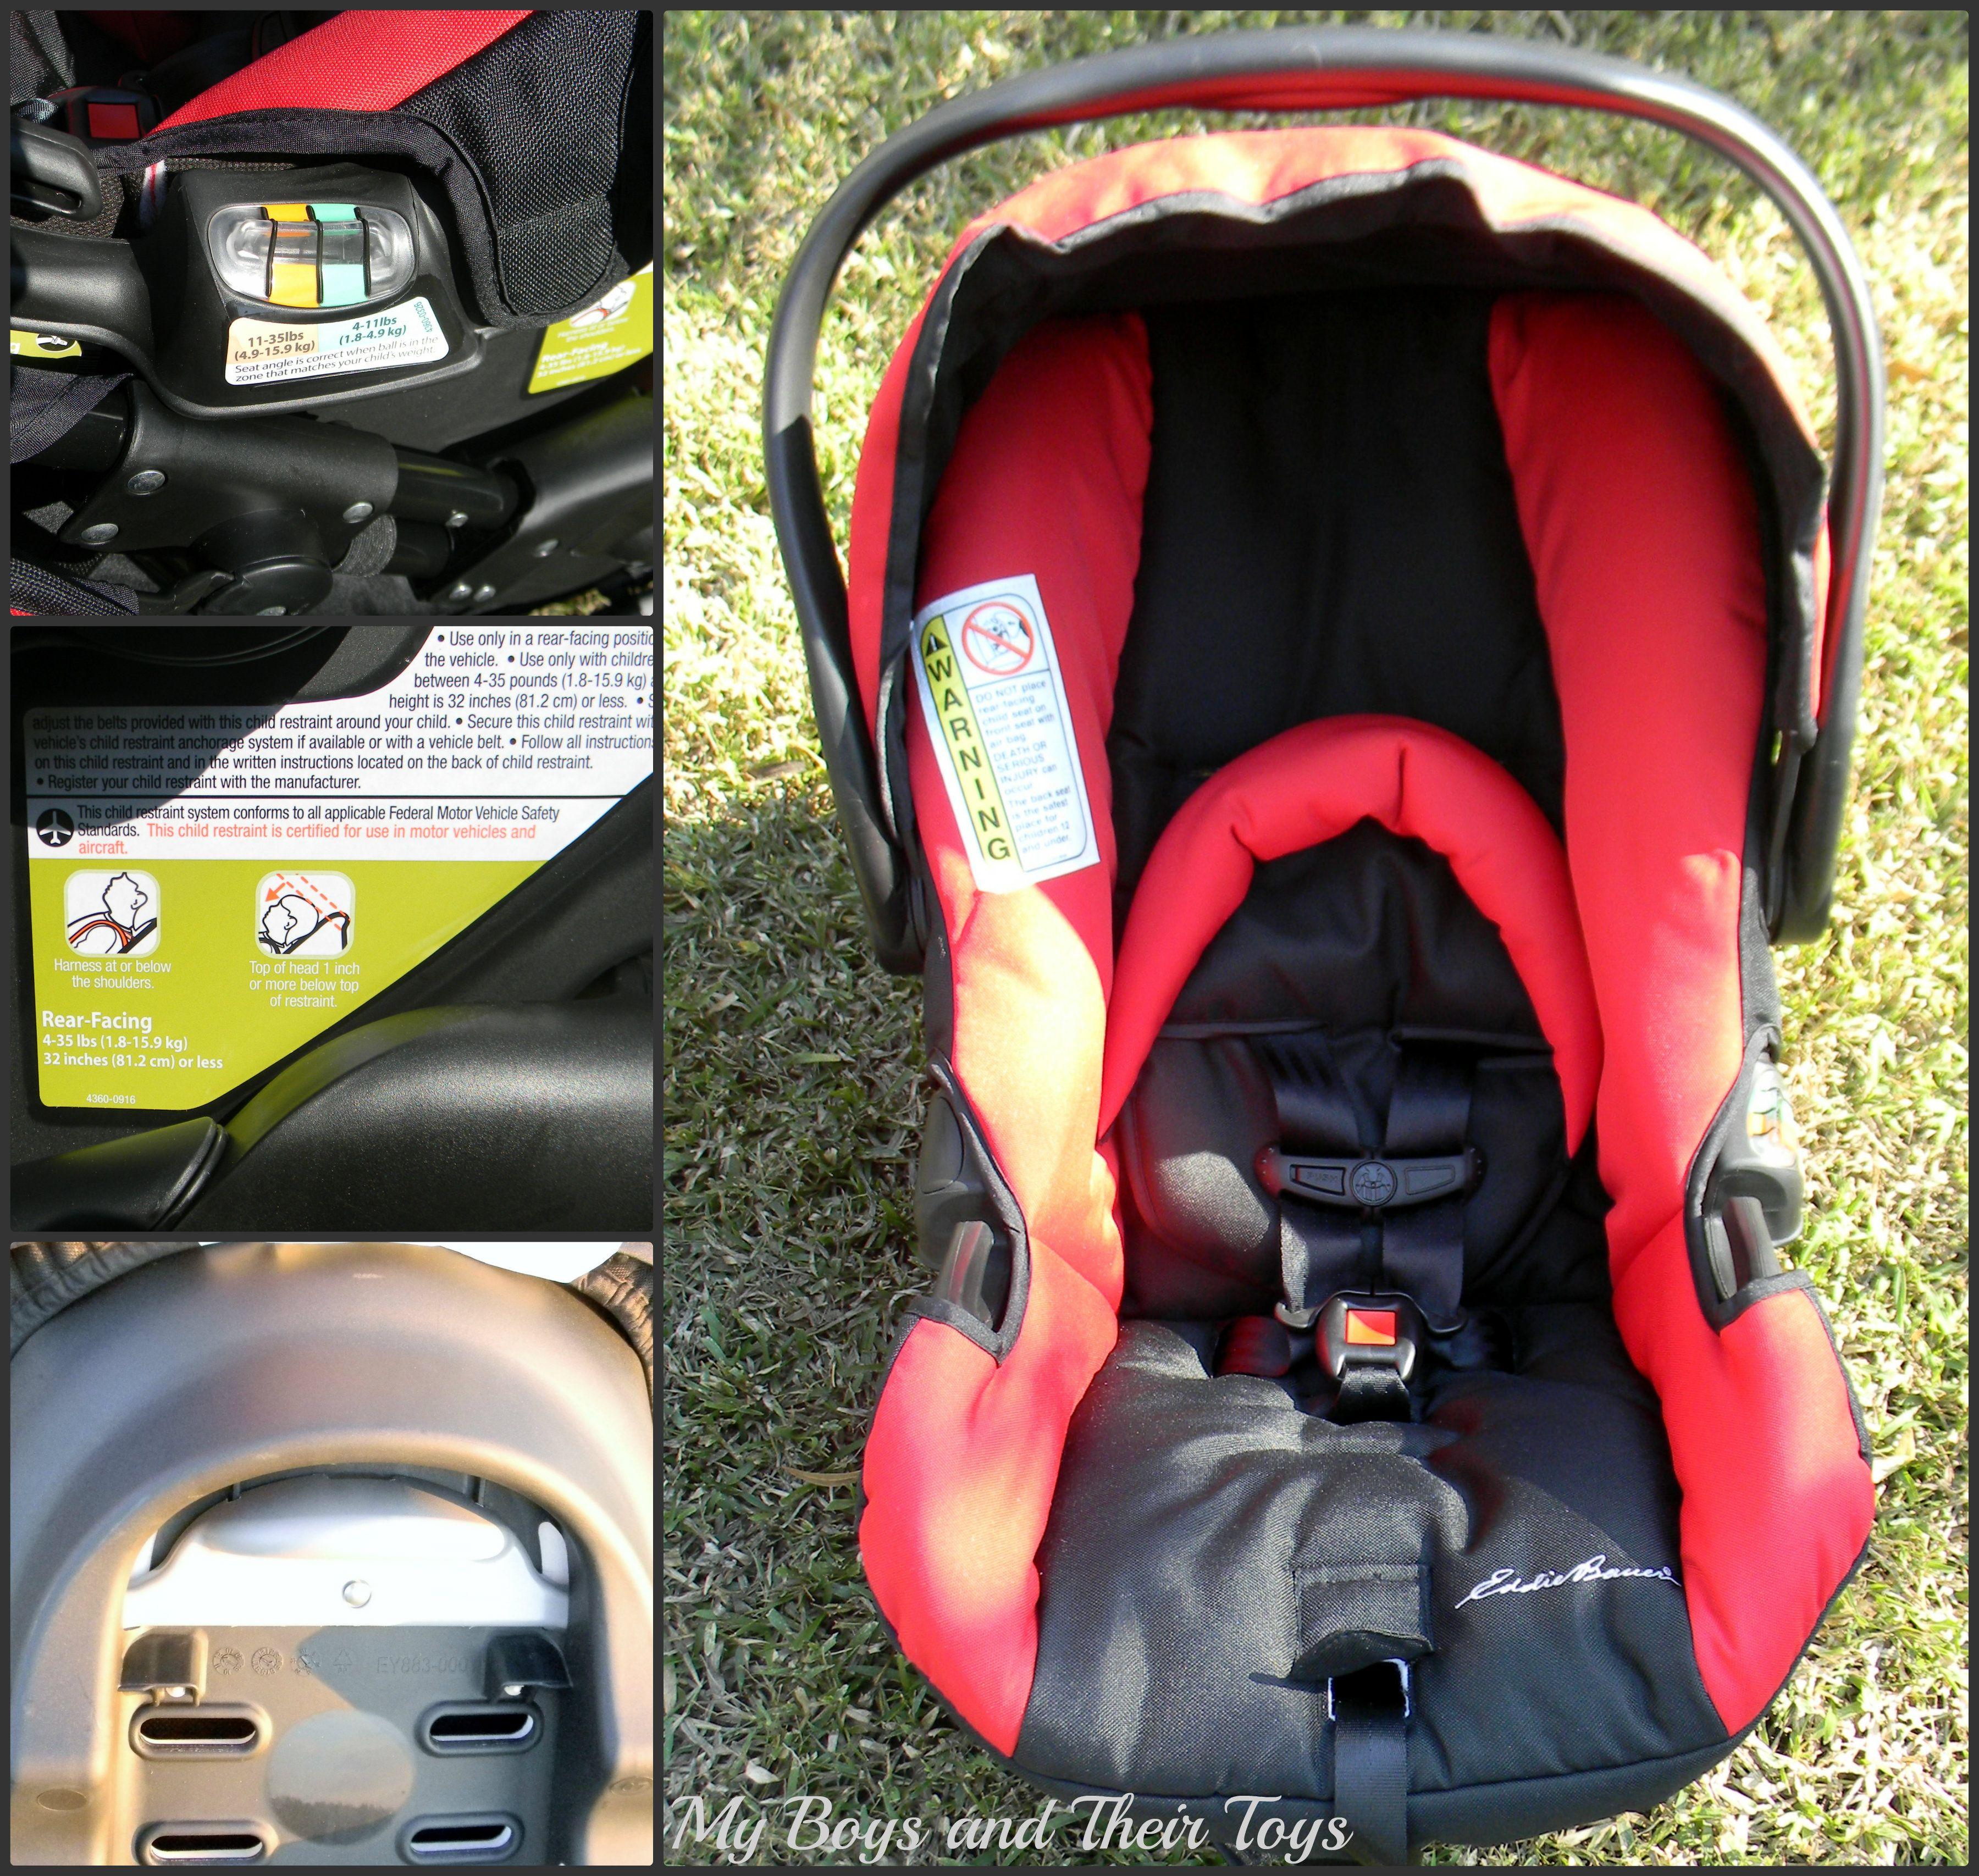 Child toys car  Eddie Bauer Trail Hiker Travel System Review  My Boys u Their Toys